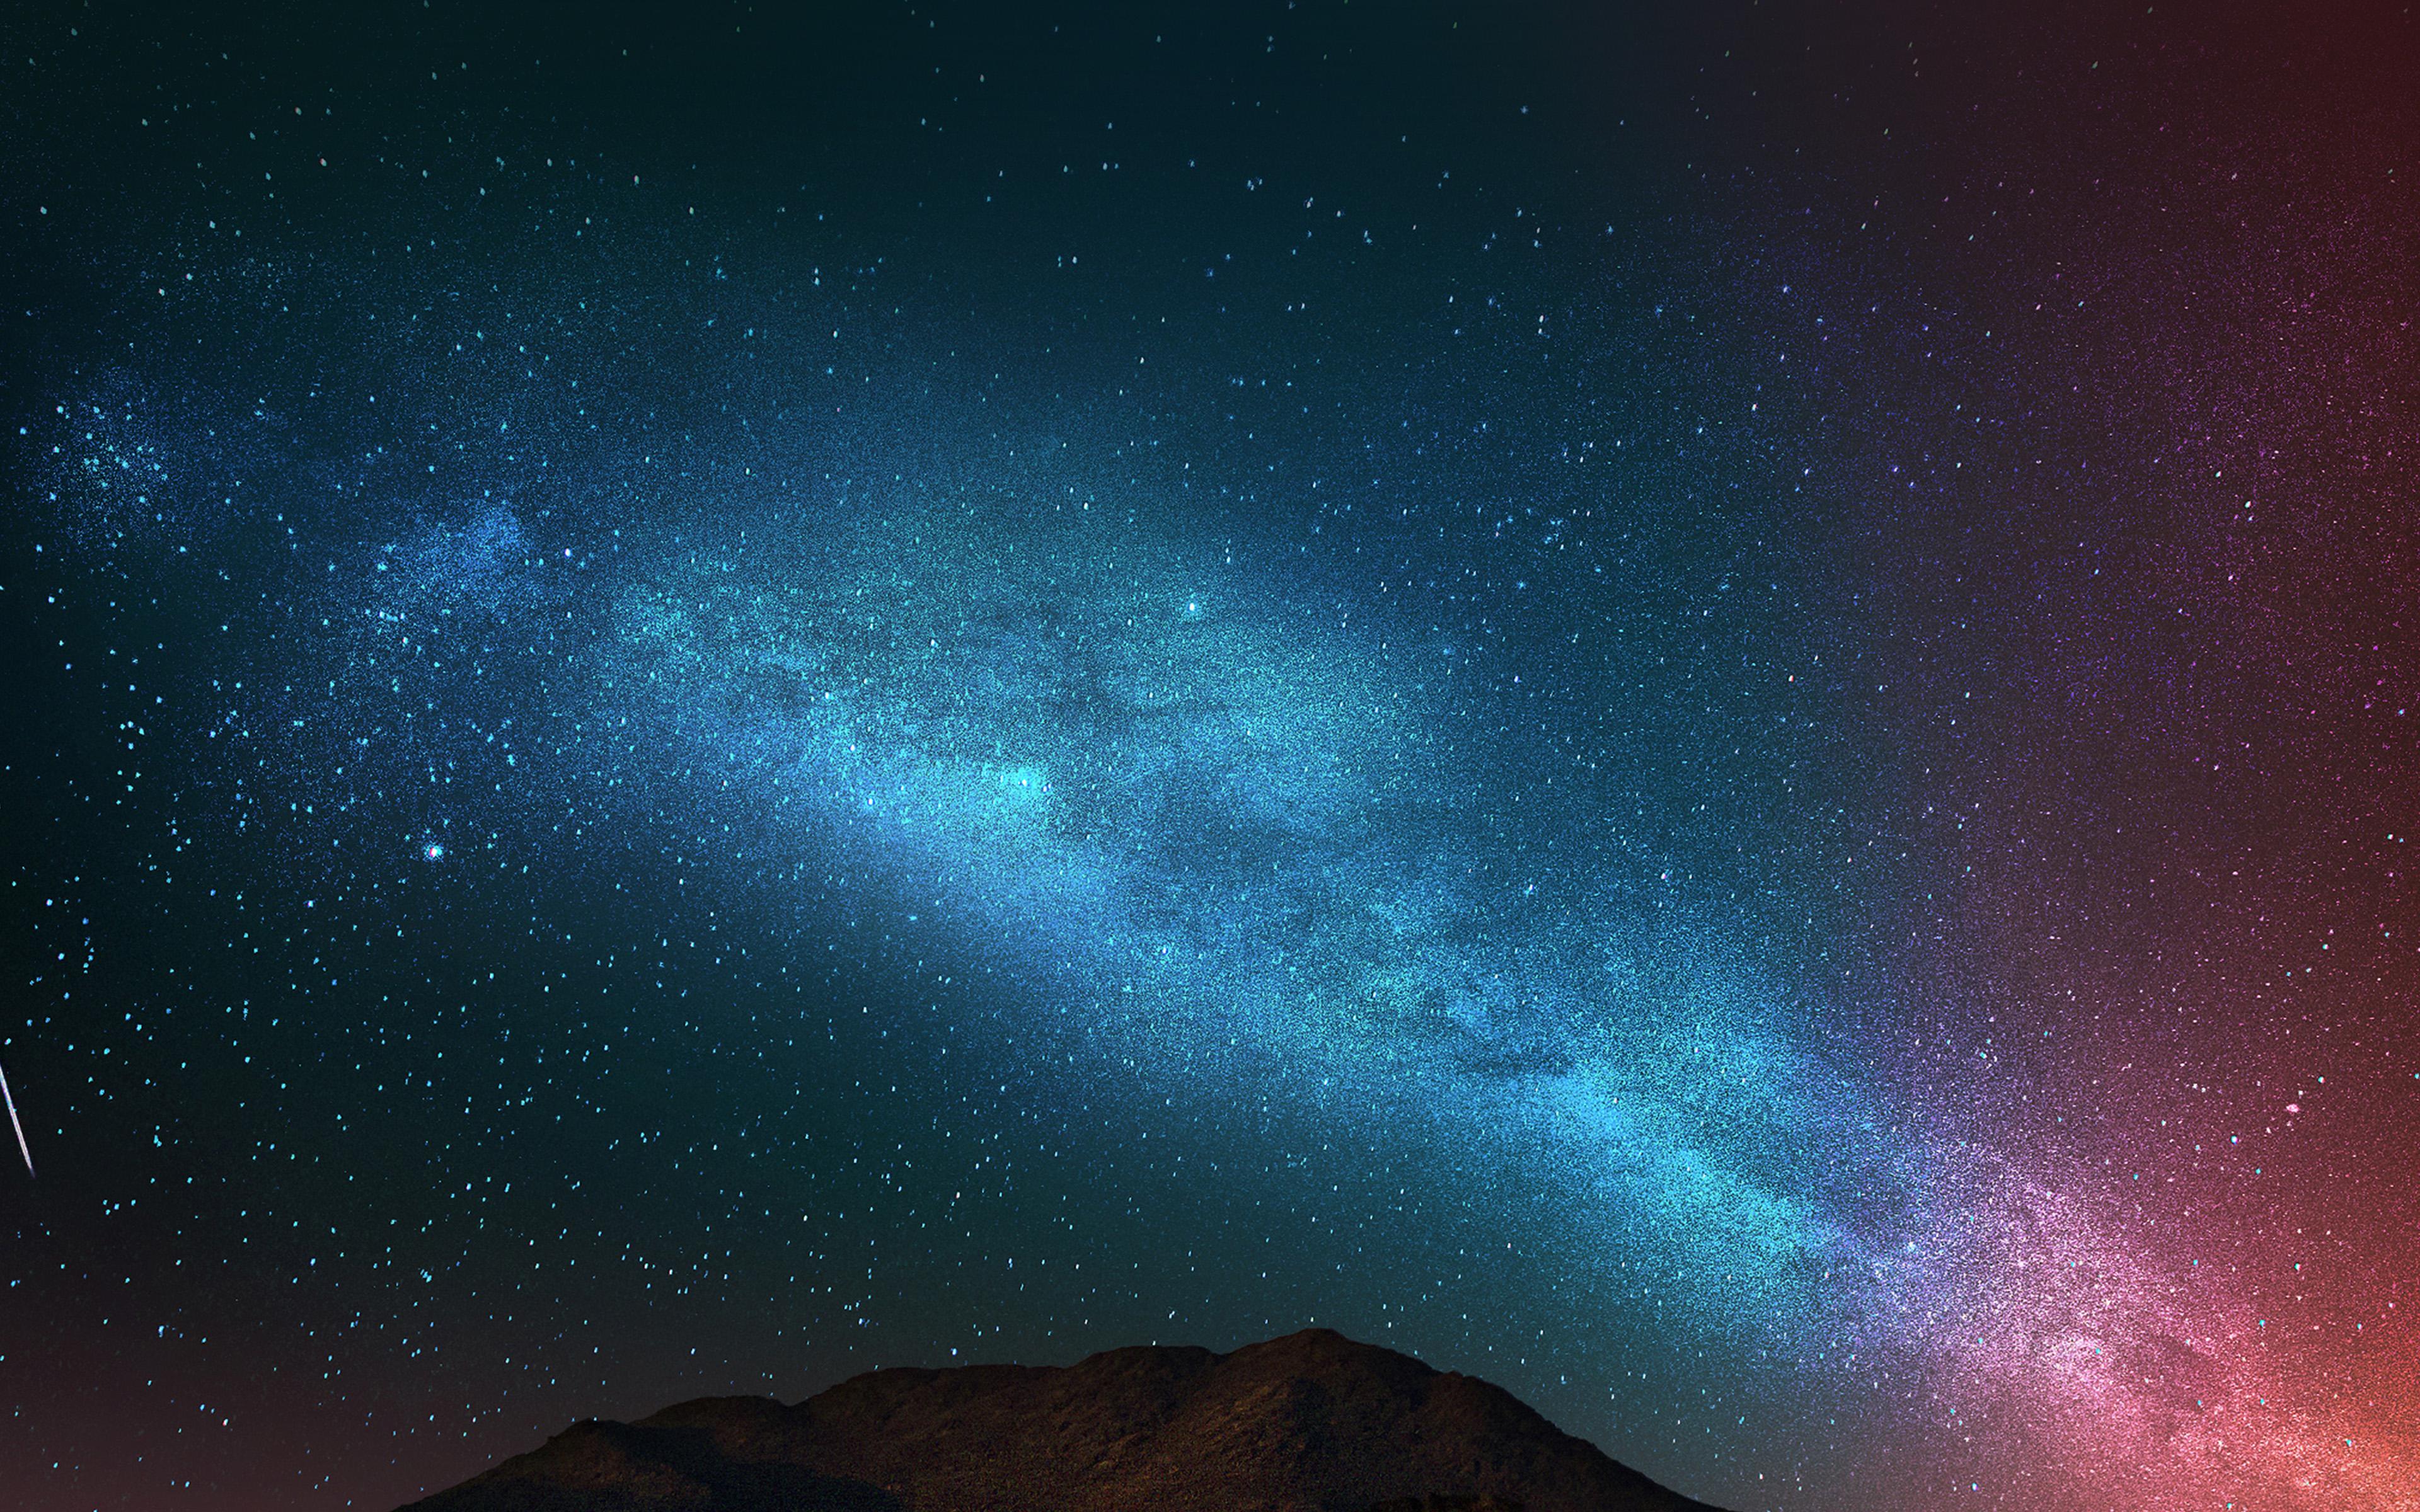 an88 night sky dark color star shining nature wallpaper